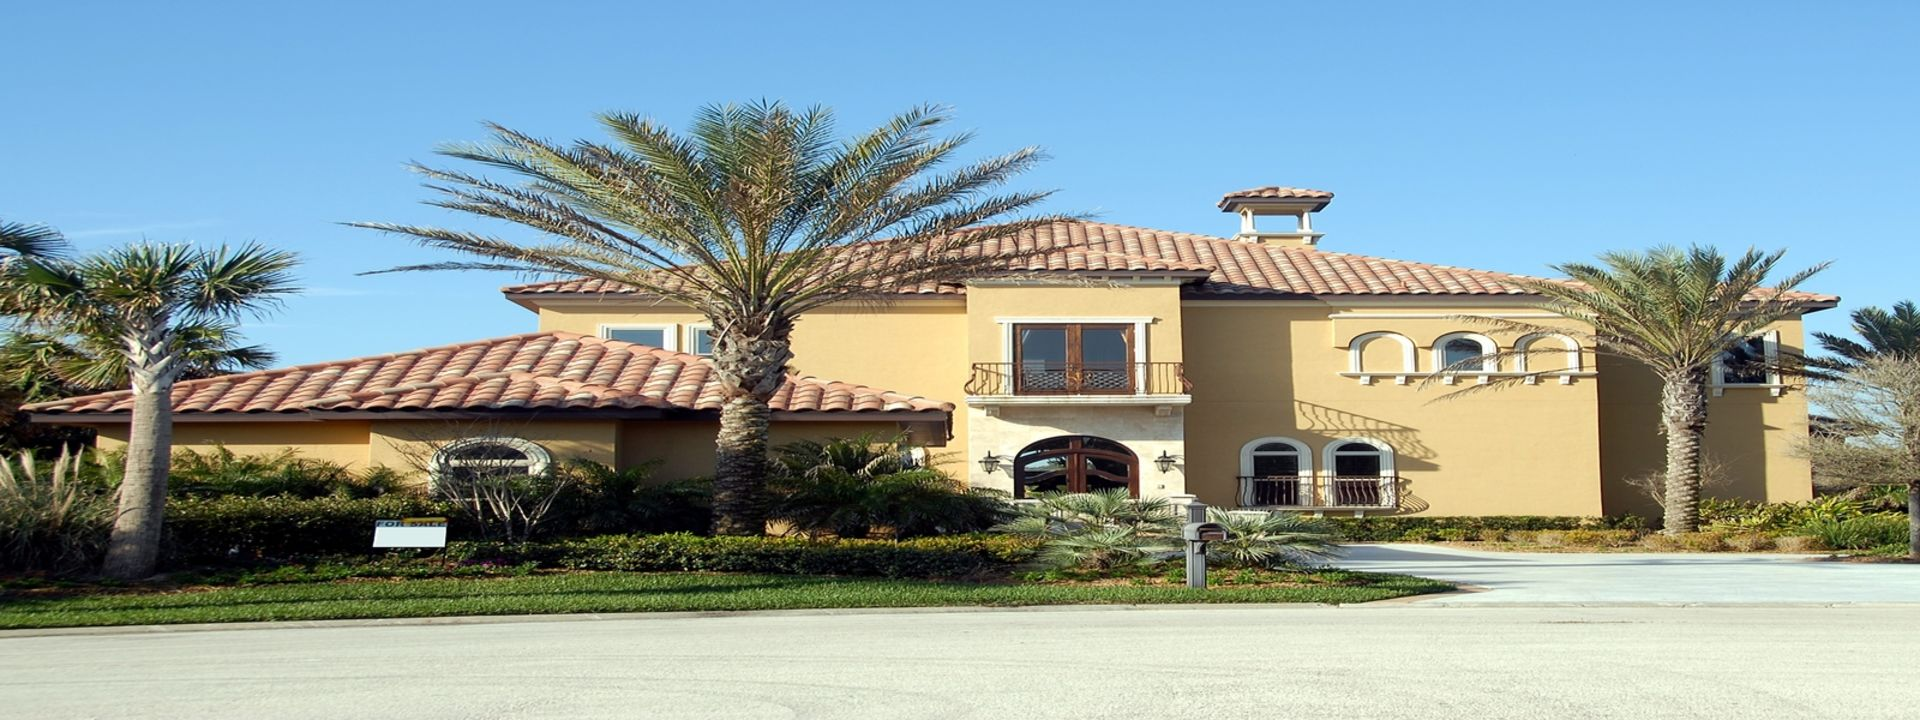 Parkside Homes for sale in Boca Raton